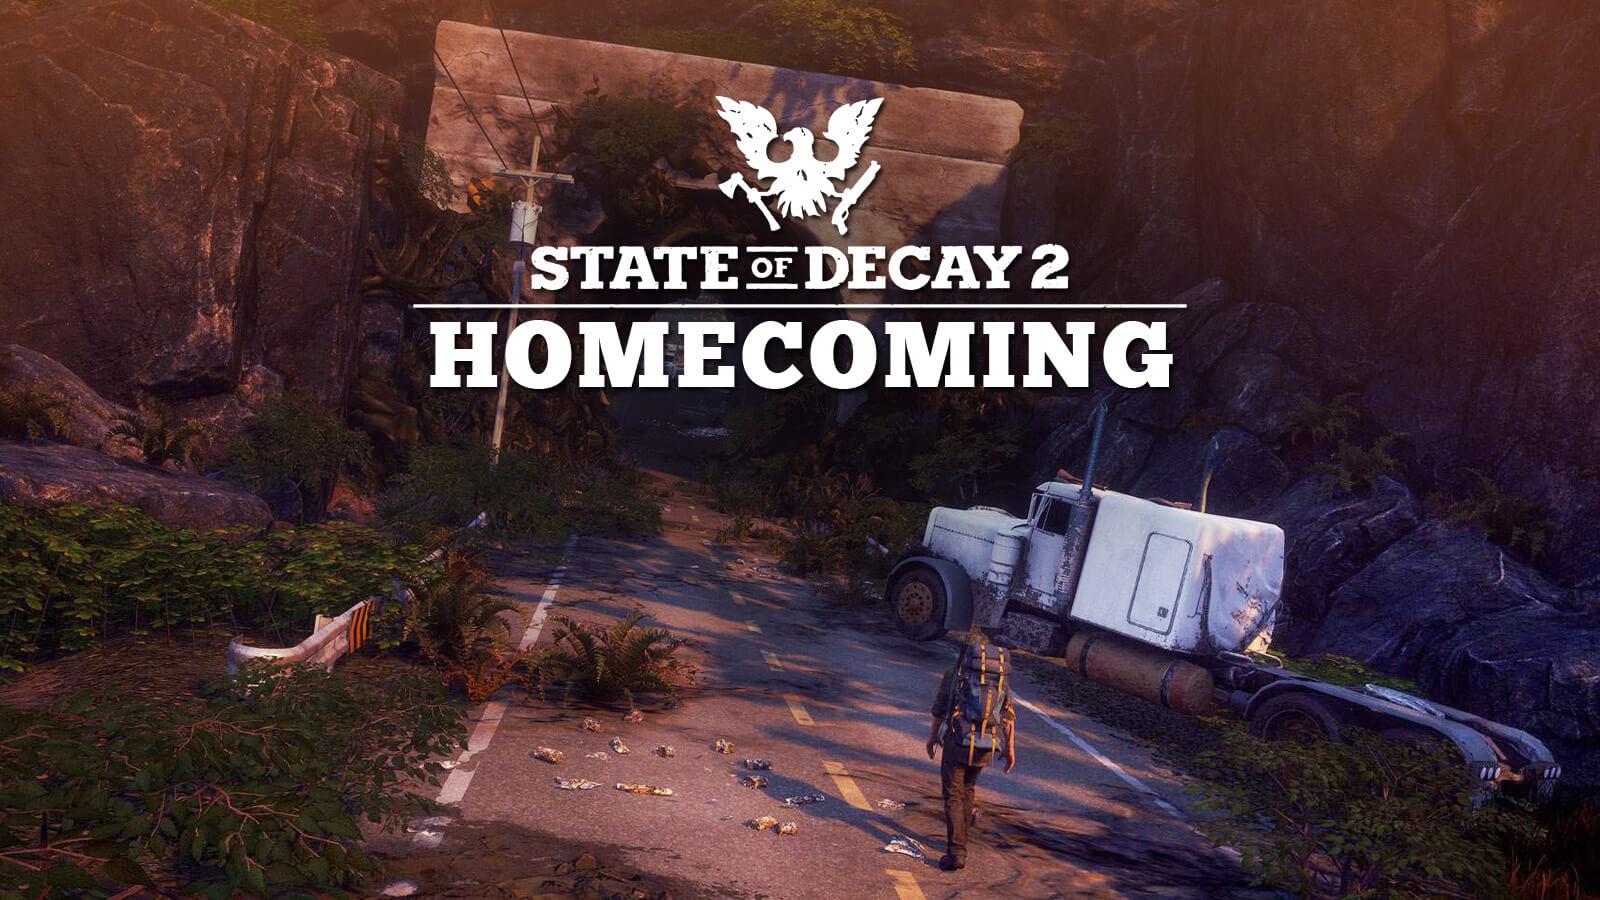 State of Decay 2: Juggernaut+Homecoming+Sea of Thieves  со скидкой, онлайн, аккаунт АВТОАКТИВАЦИЯ | PC (Region Free)